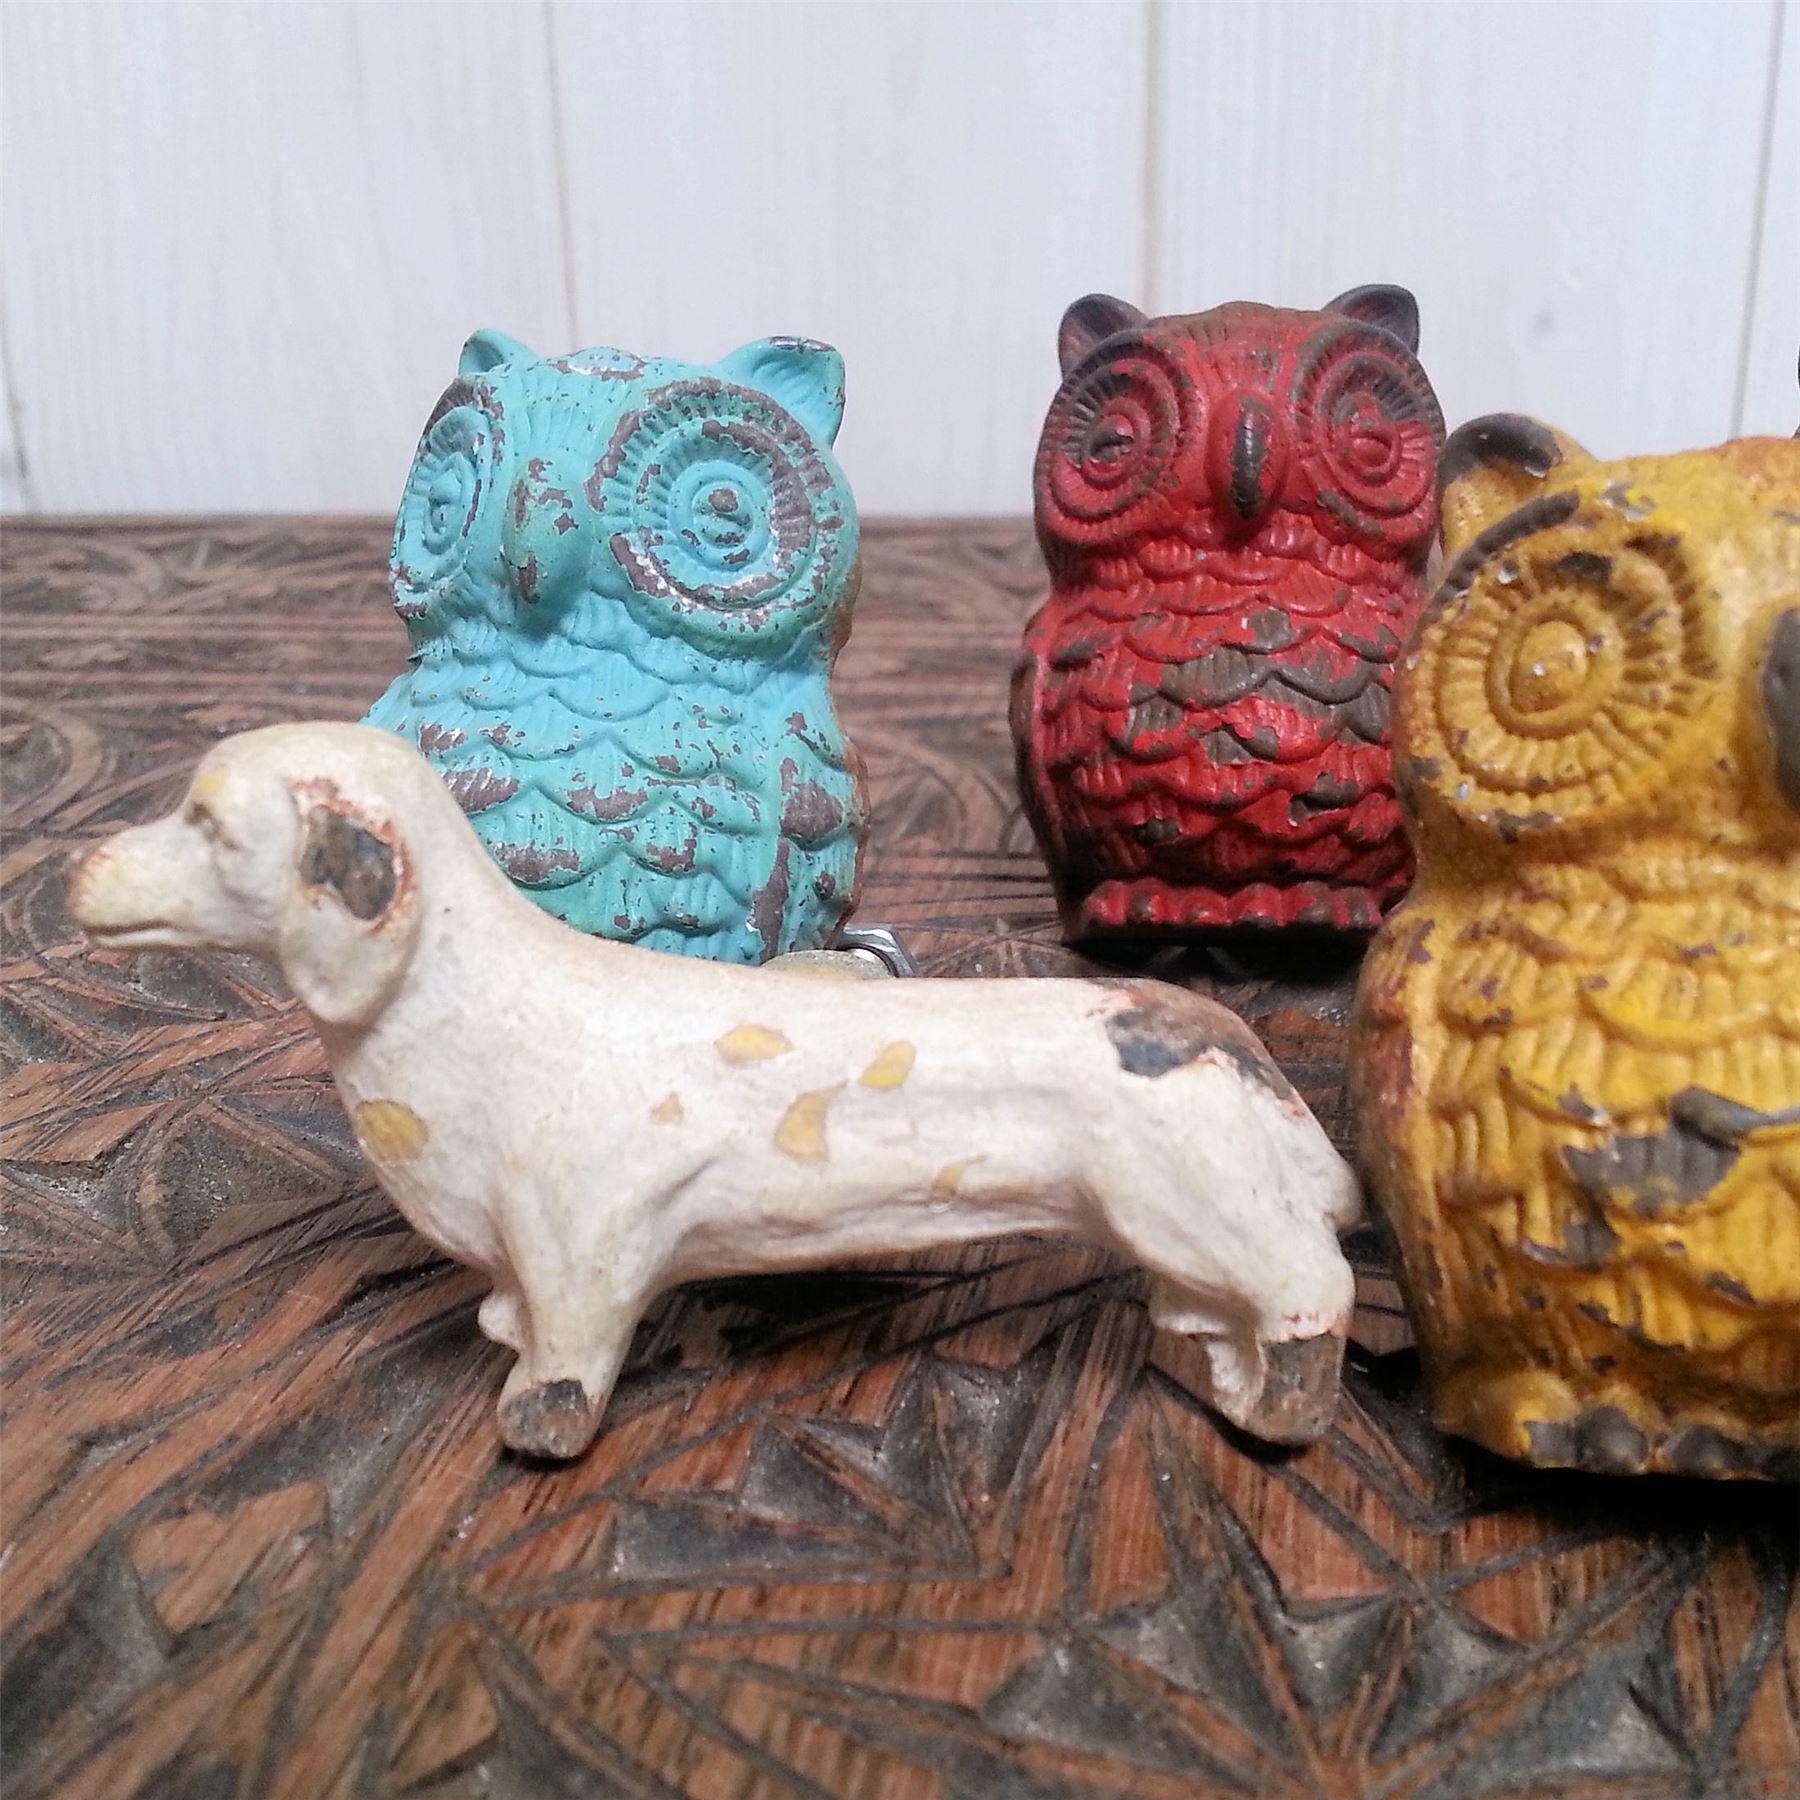 DOGS OWL SWALLOWS DOOR KNOBS DRAWER PULLS HANDLES METAL VTG PAINTED ...